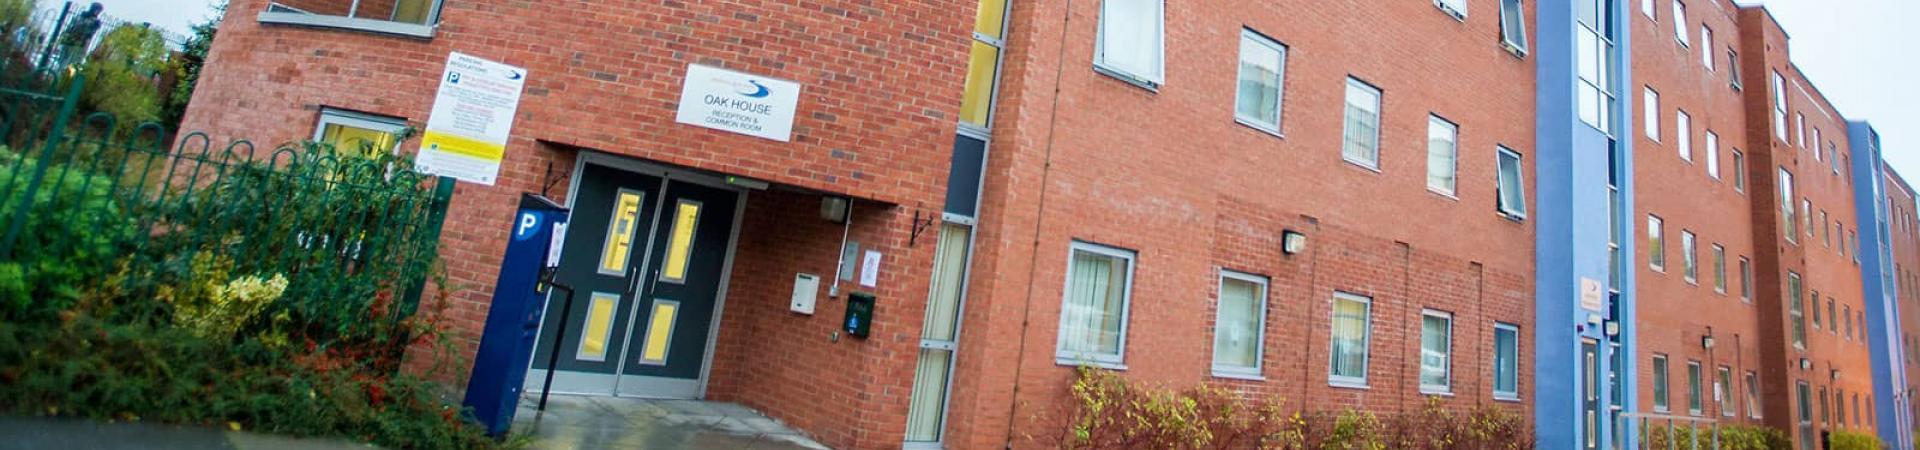 external banner for Oak & Willows House, Stratford-upon-Avon